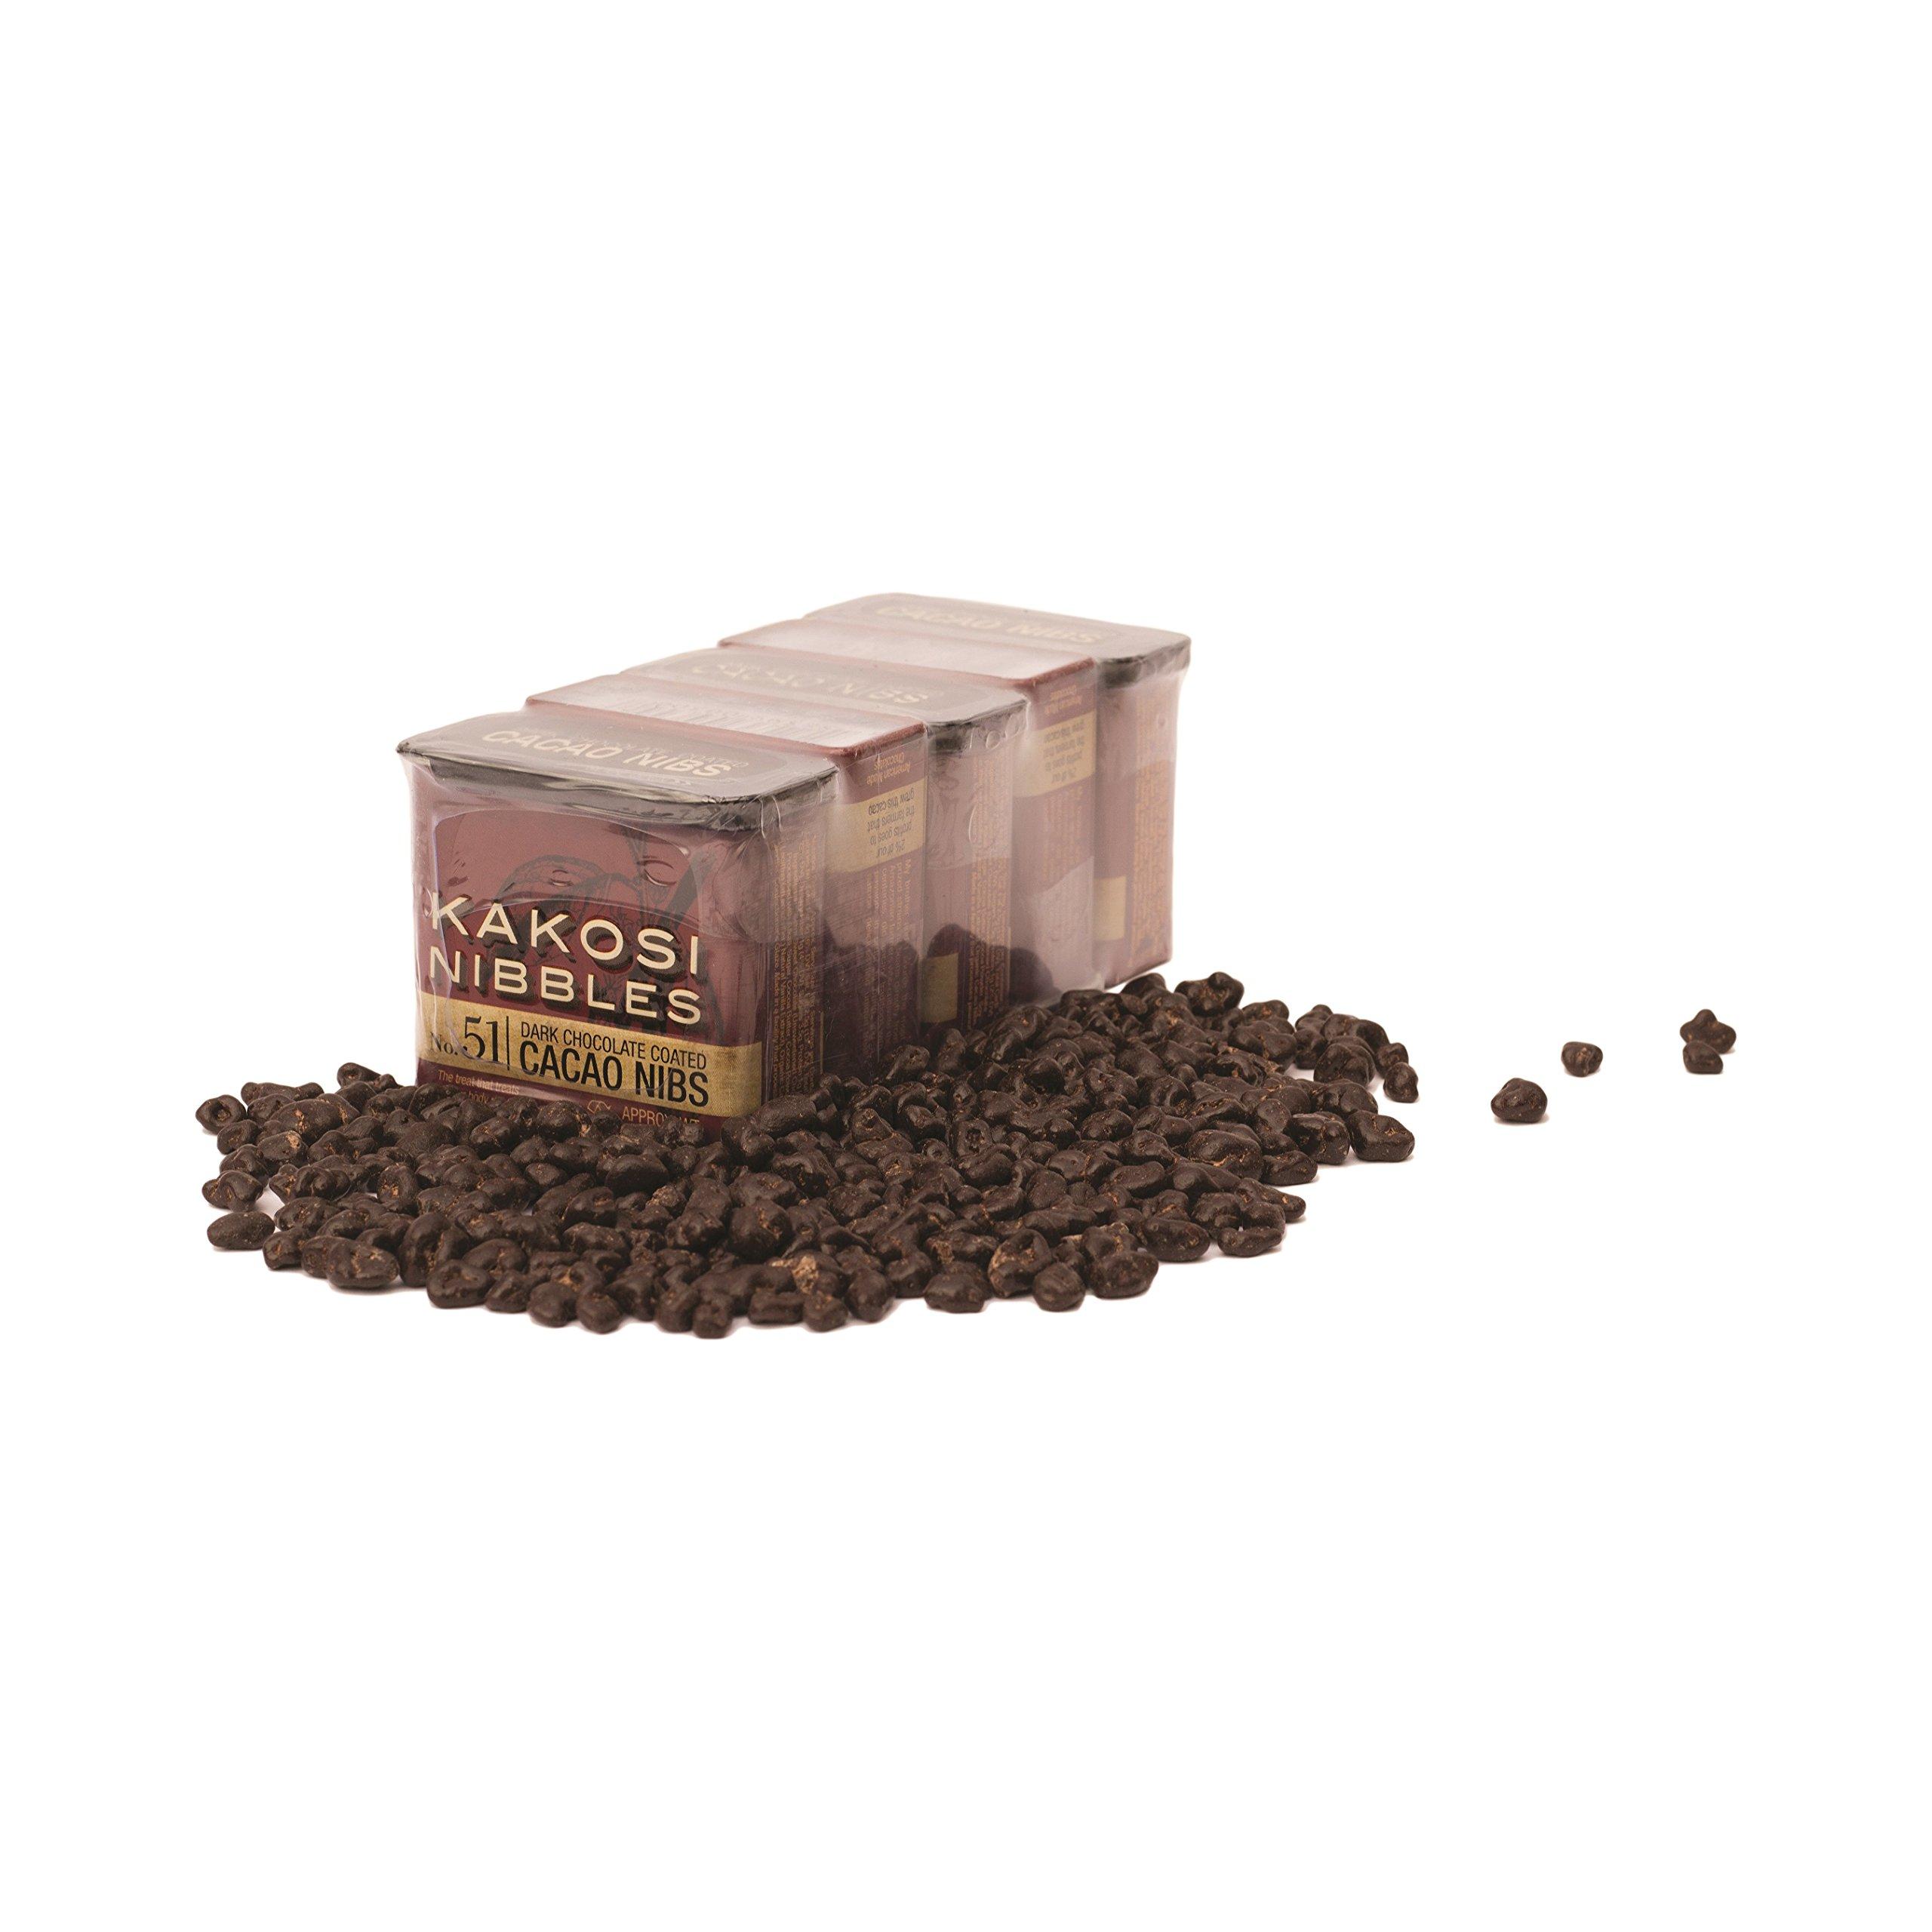 KAKOSI Chocolate Covered Nibs - 5 Pack